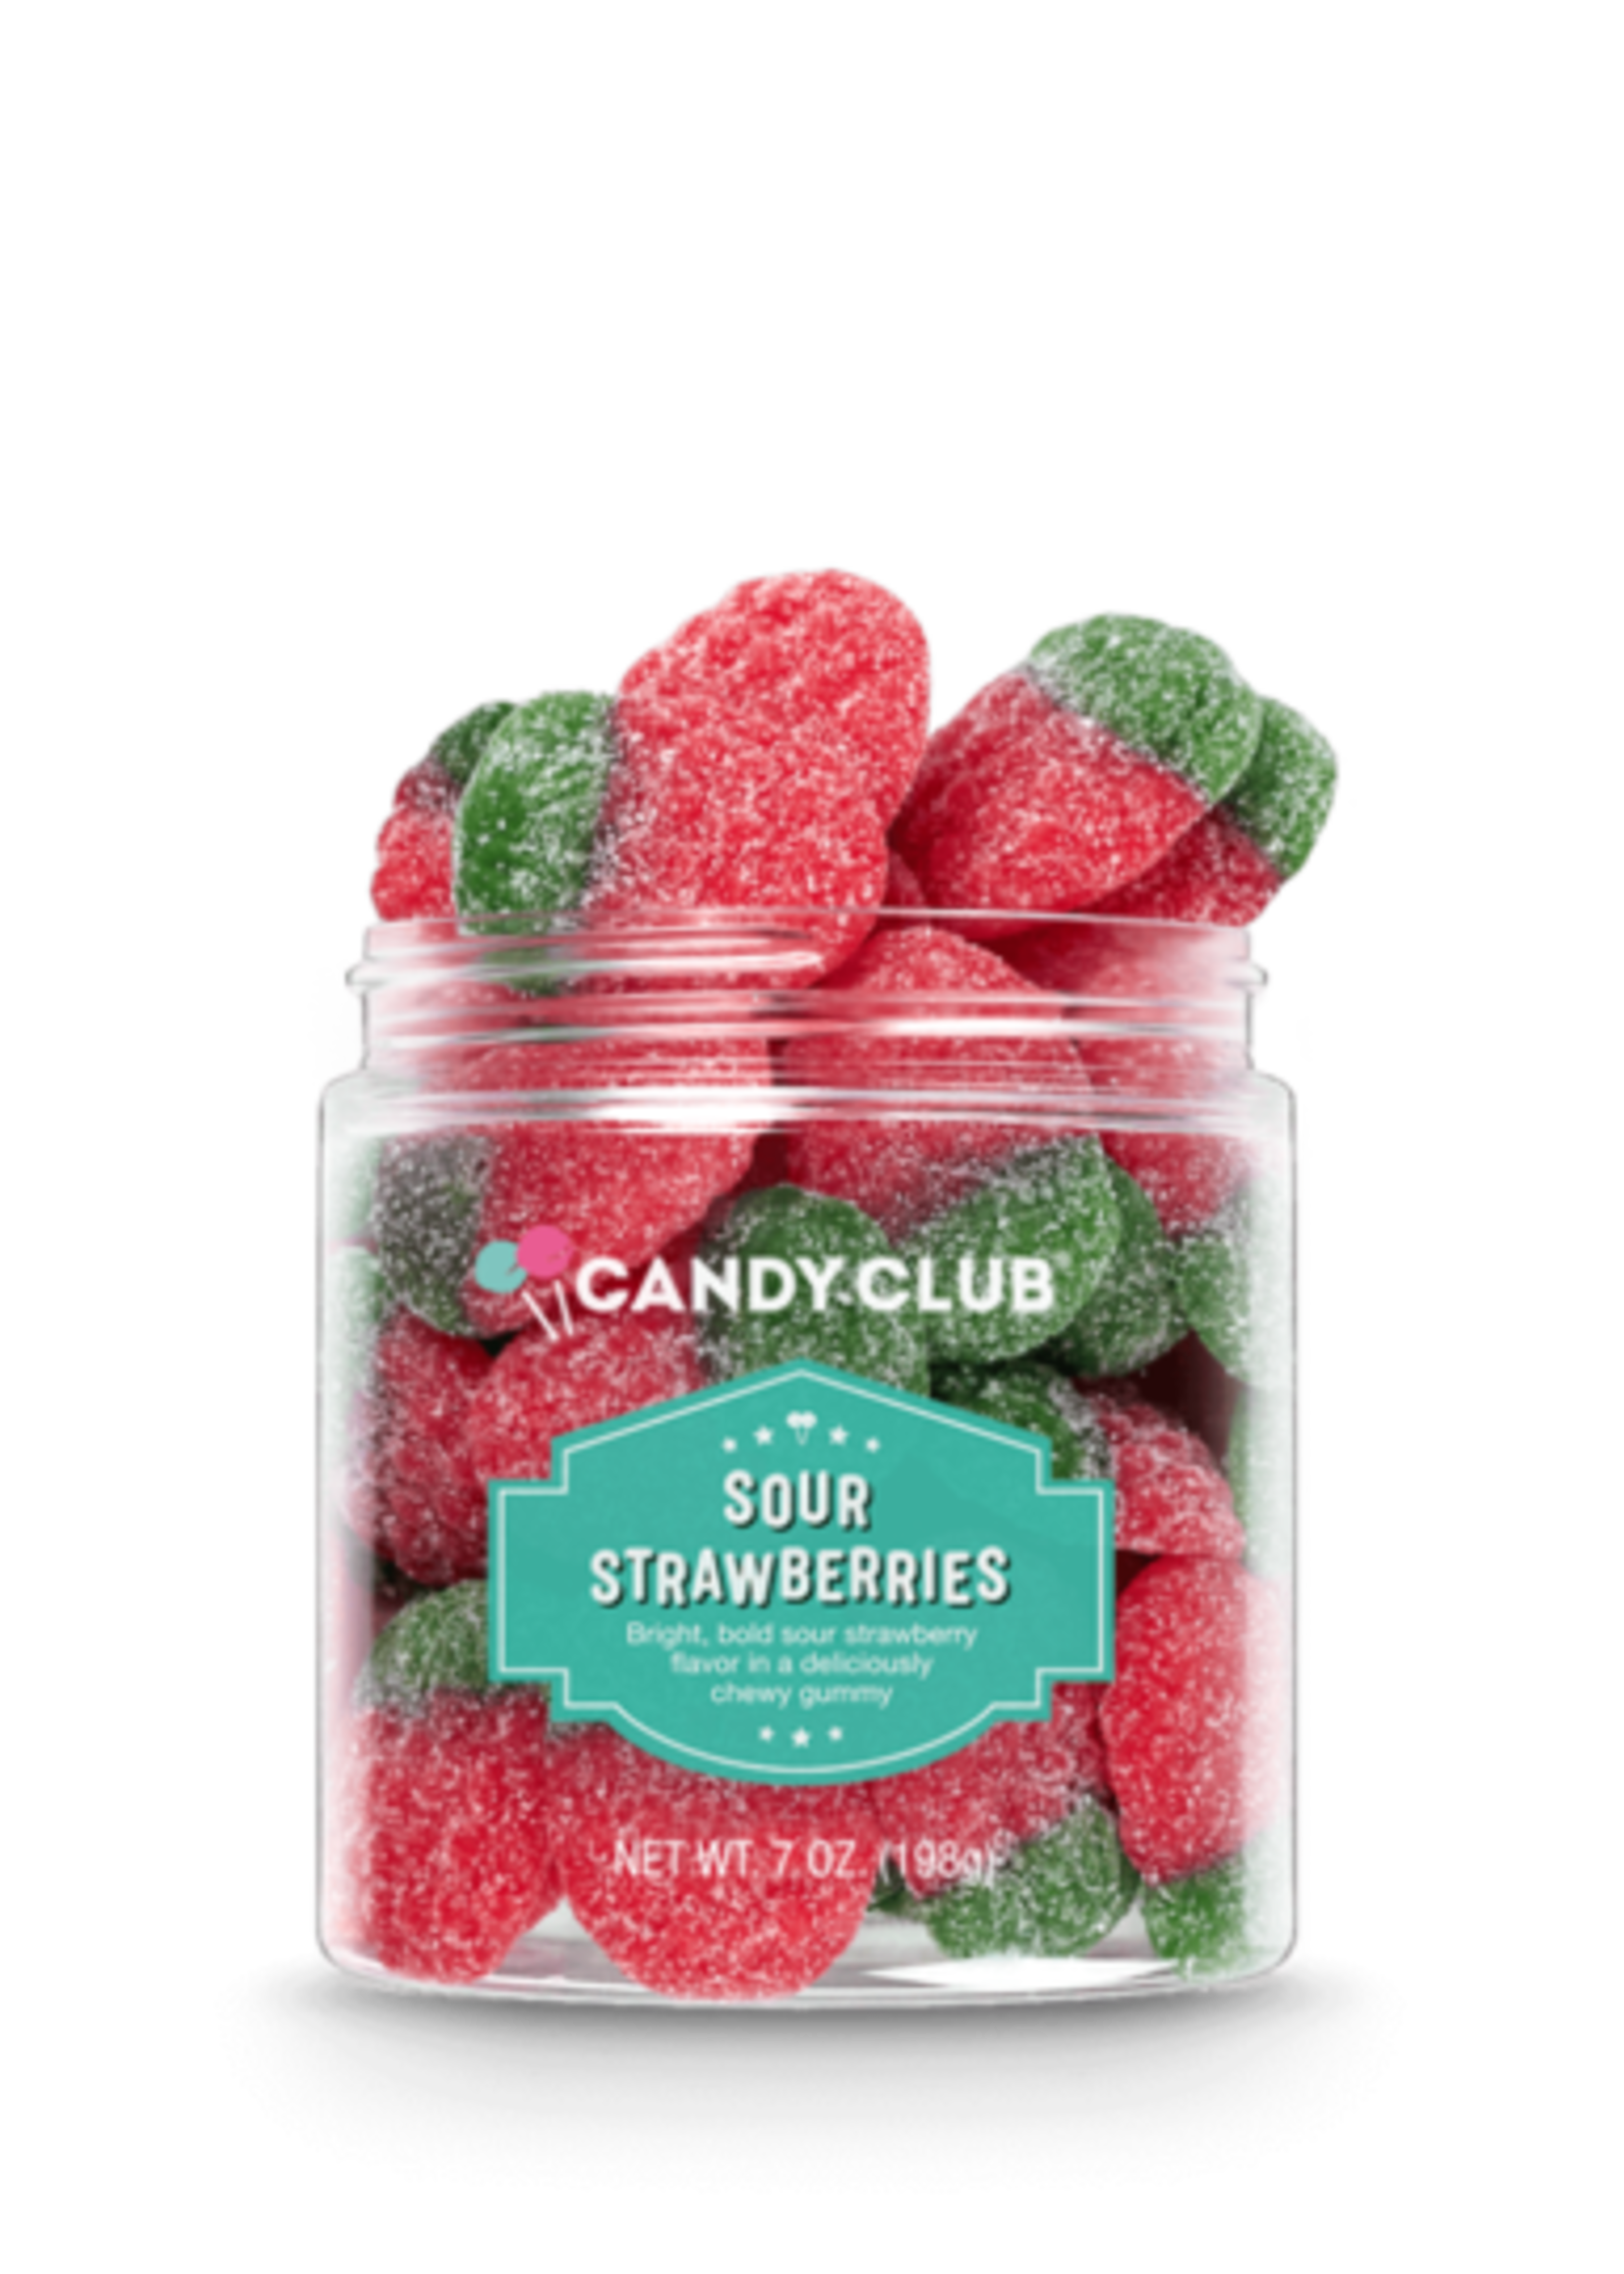 CANDY CLUB CANDY CLUB SOUR STRAWBERRIES